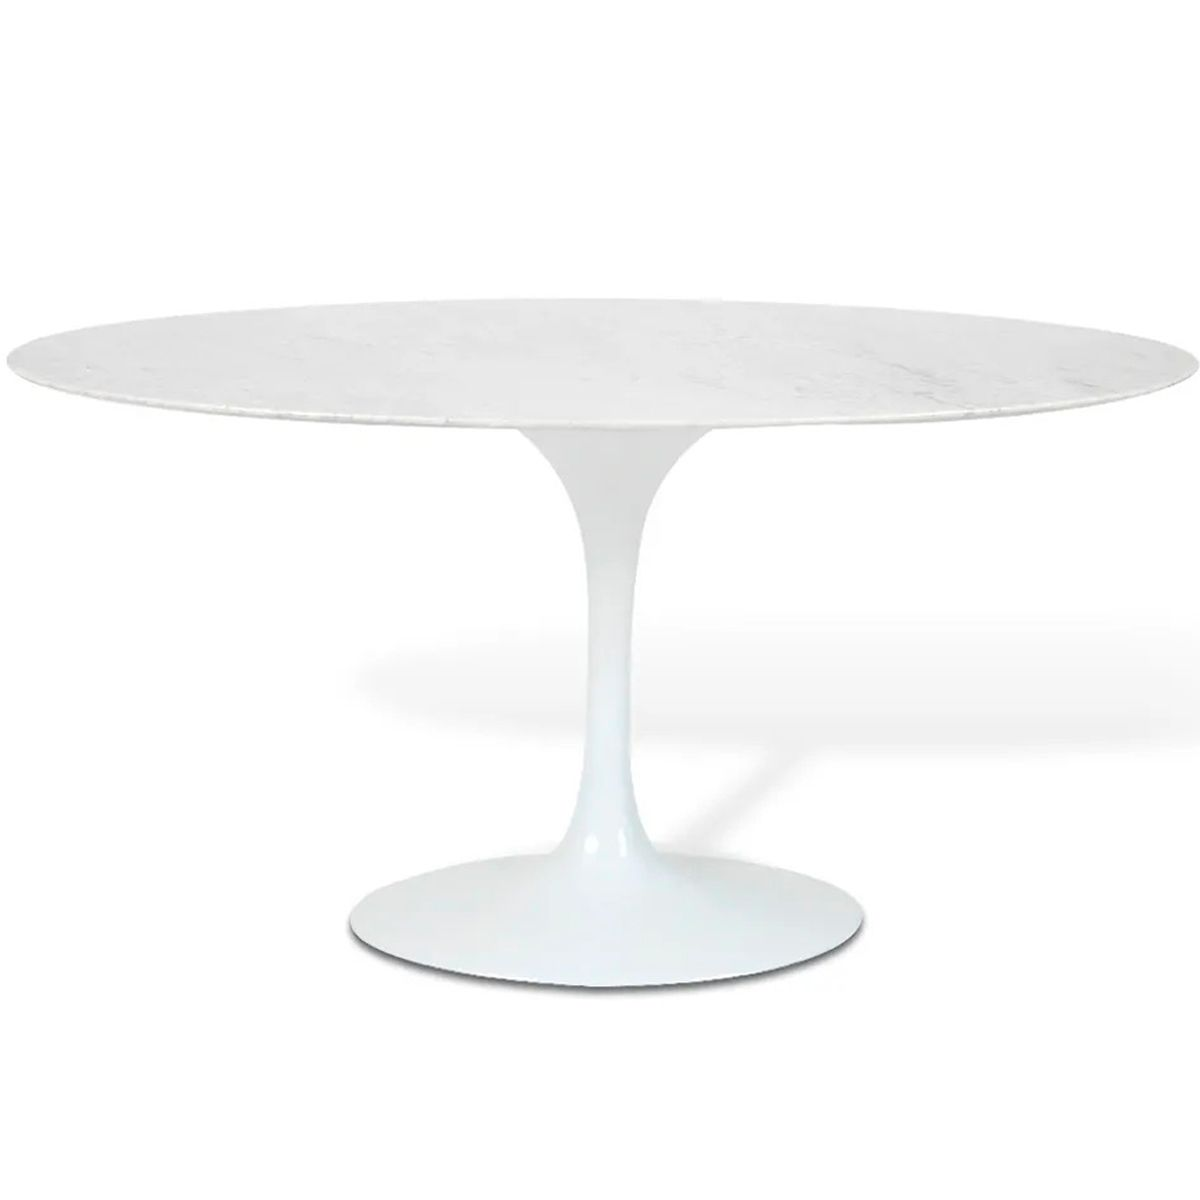 Mesa de Jantar Oval Saarinen Base Branca em Aluminio com Tampo de 120 x 80 cm